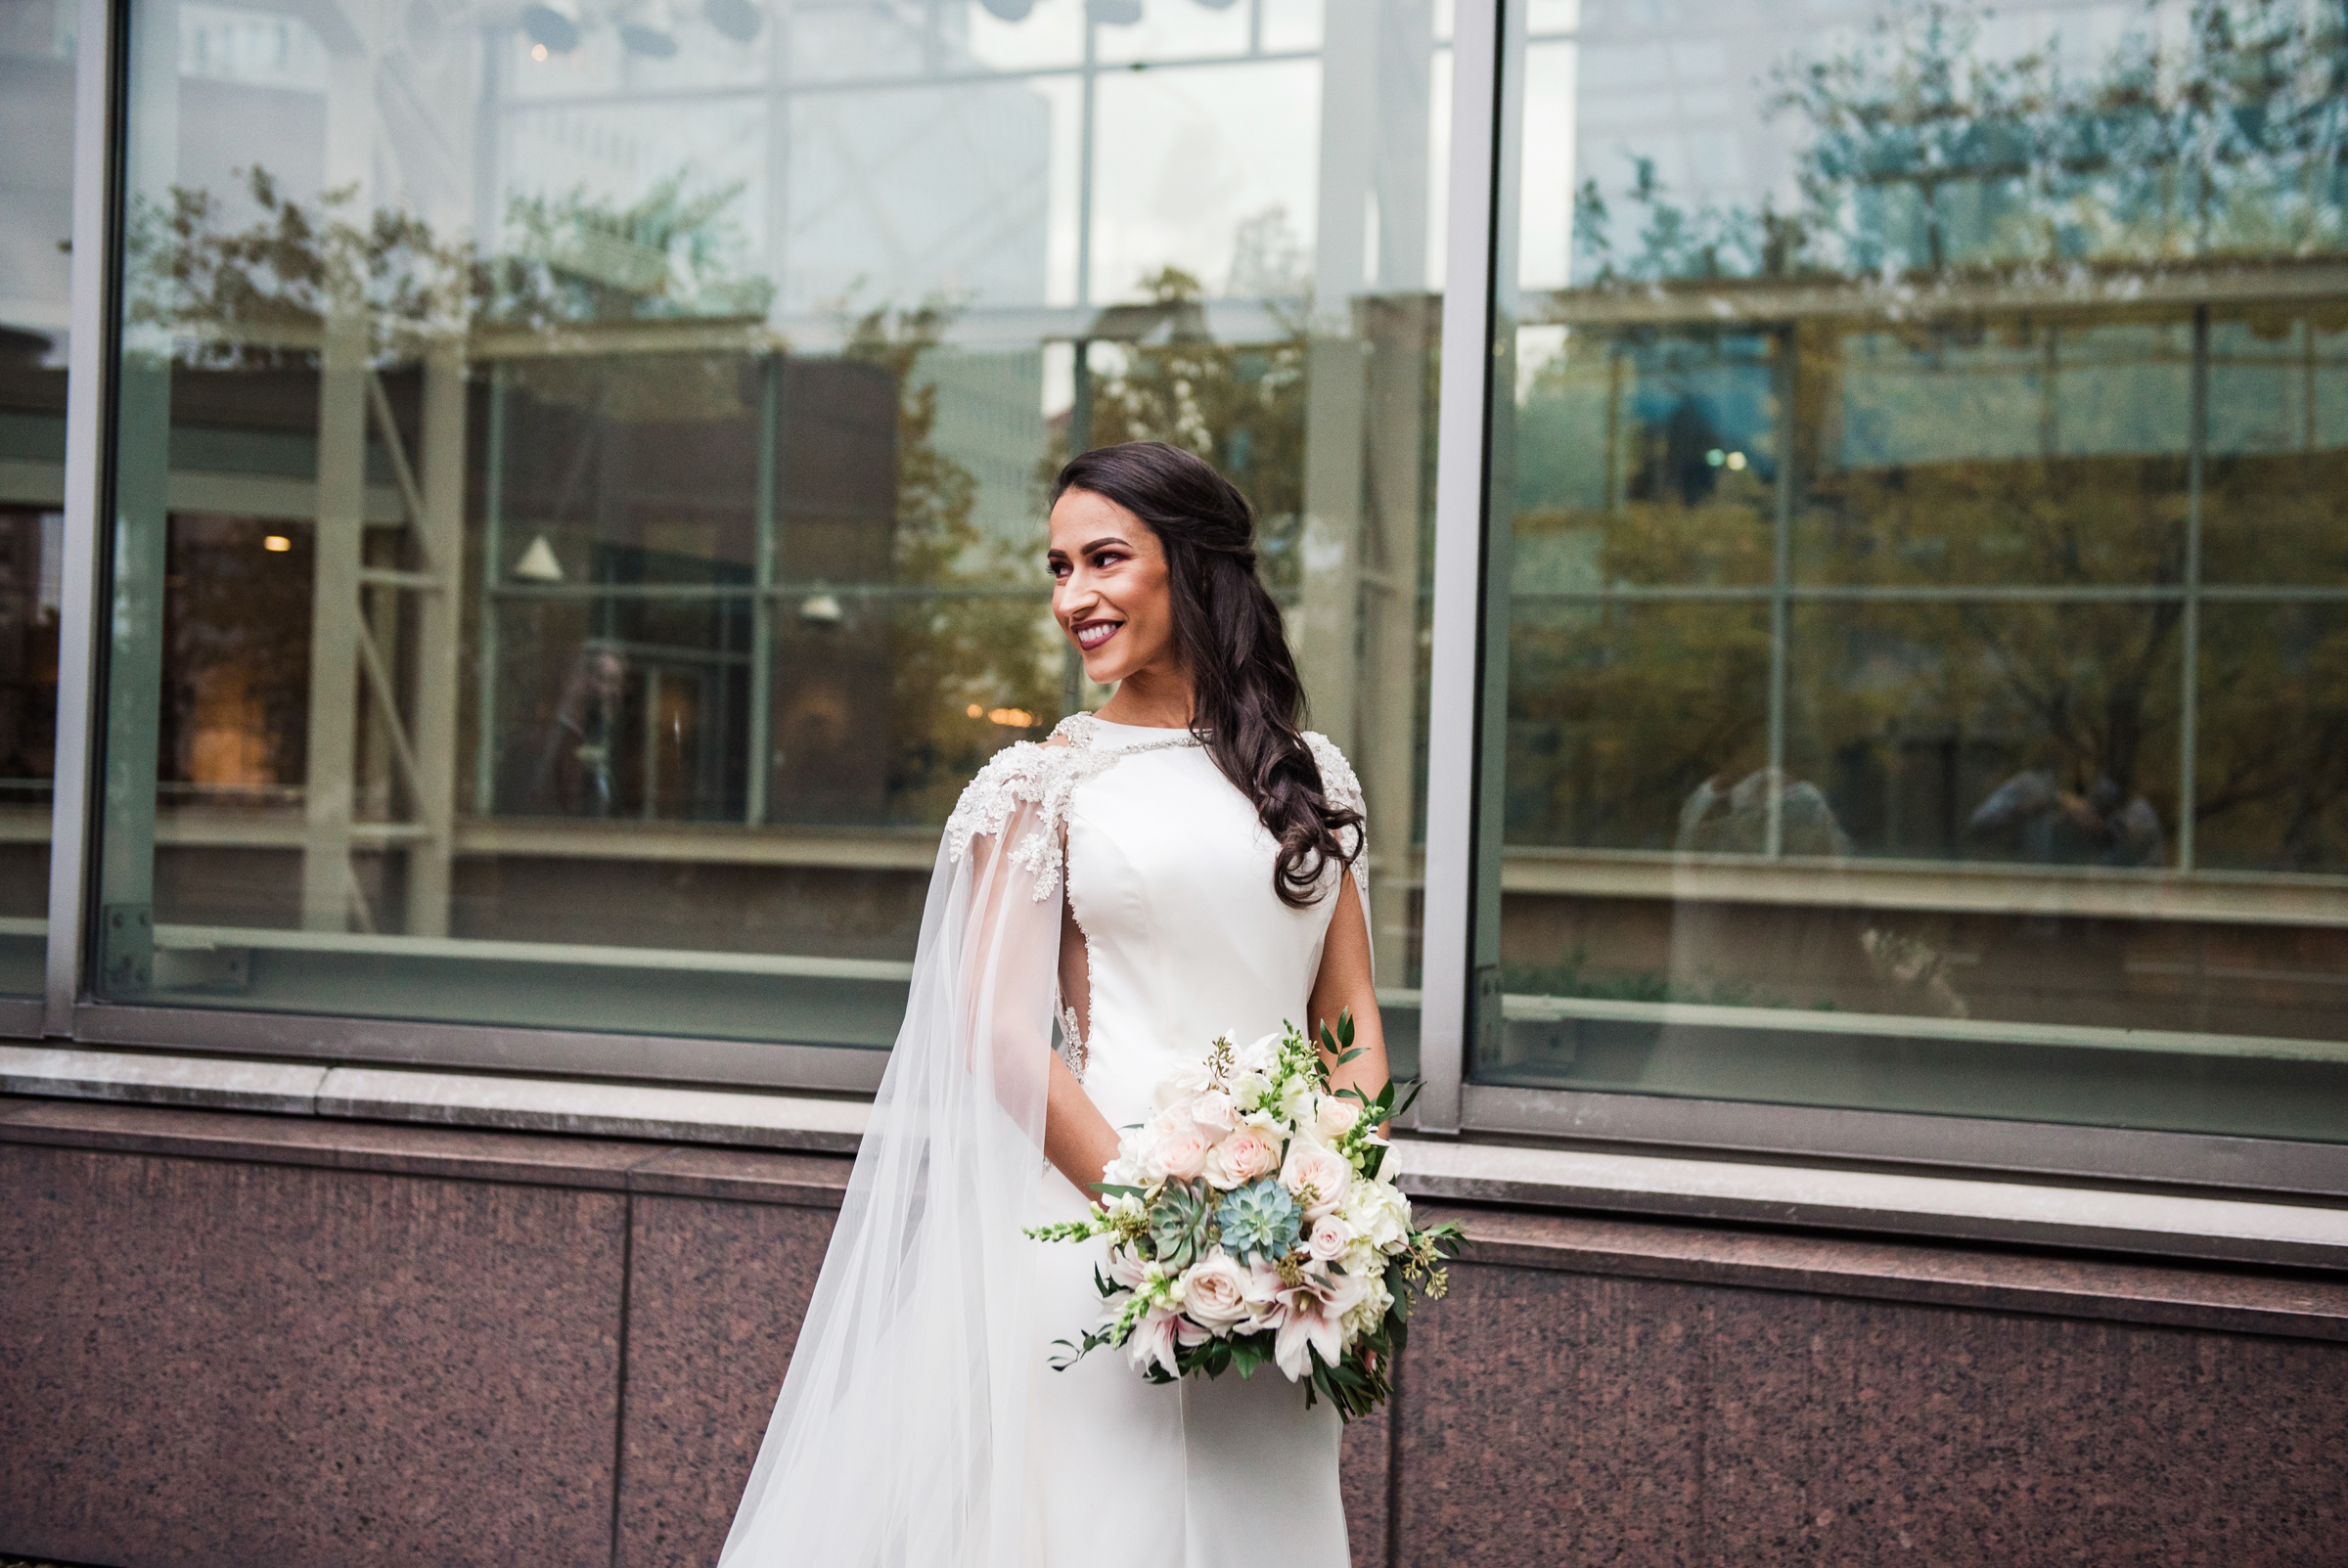 Wintergarden_by_Monroes_Rochester_Wedding_JILL_STUDIO_Rochester_NY_Photographer_174700.jpg